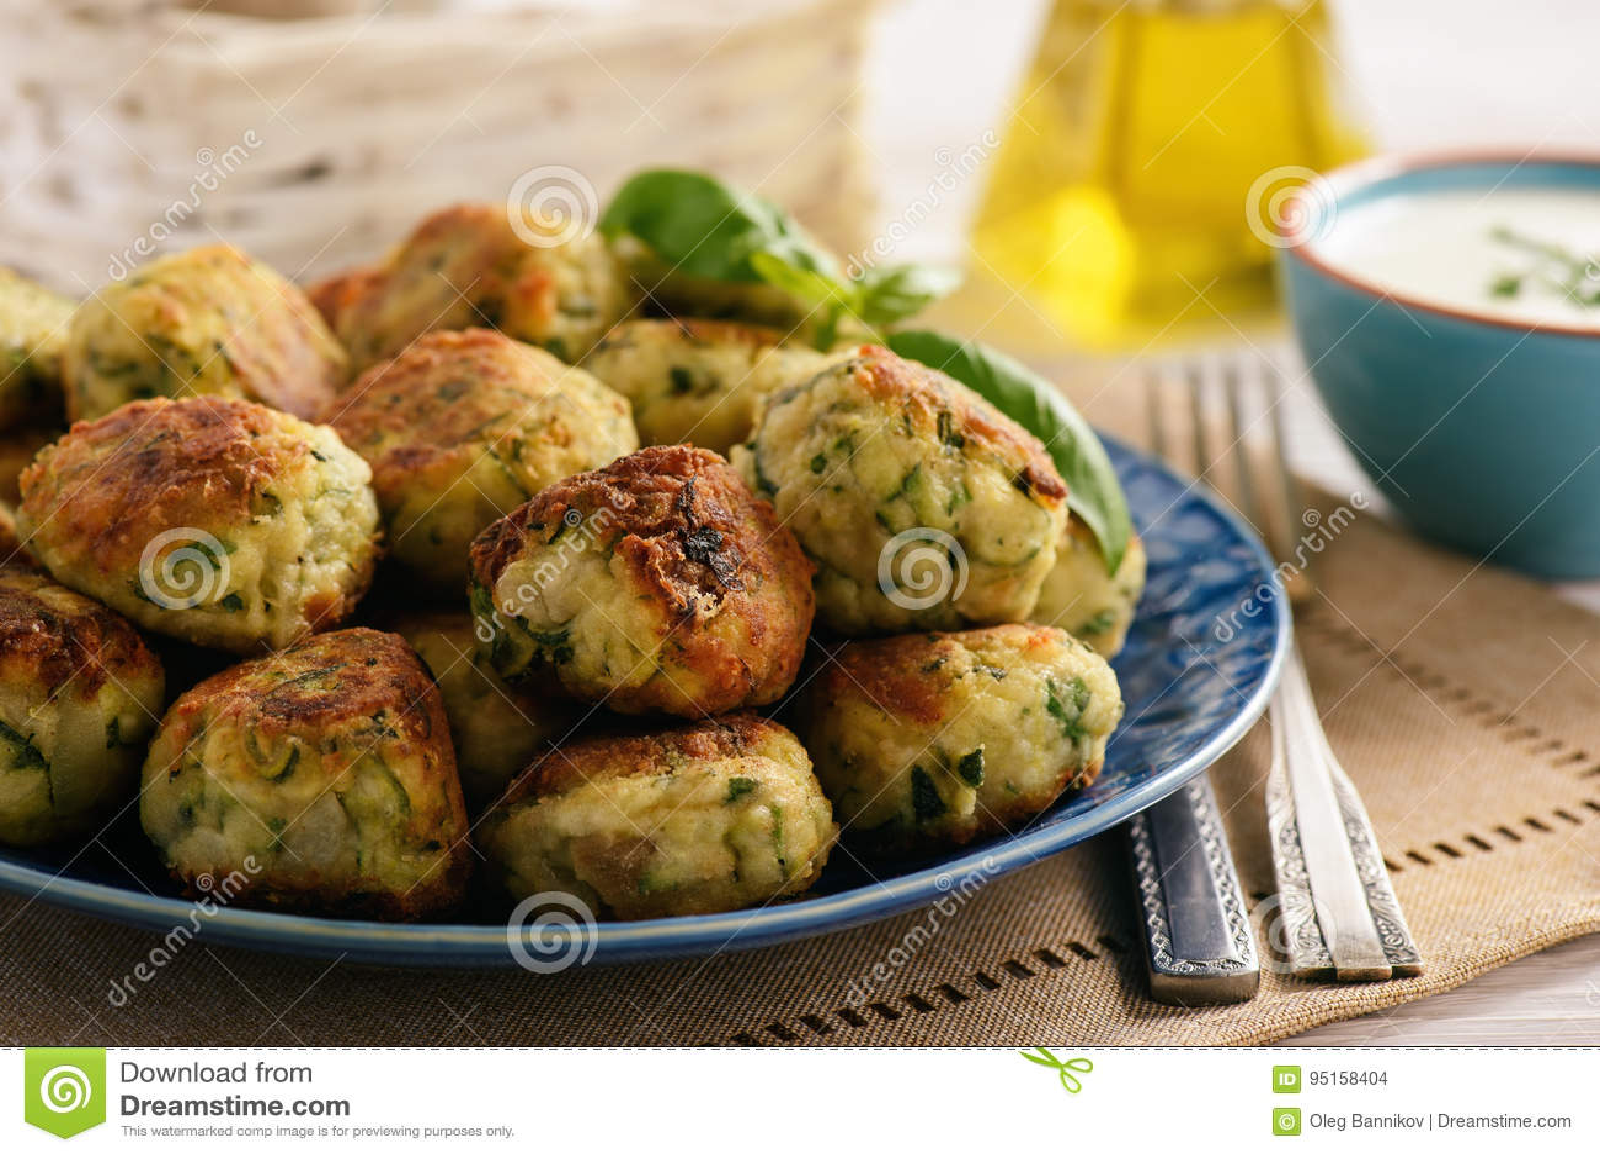 Fried crispy zucchini balls with feta cheese- vegetarian food.